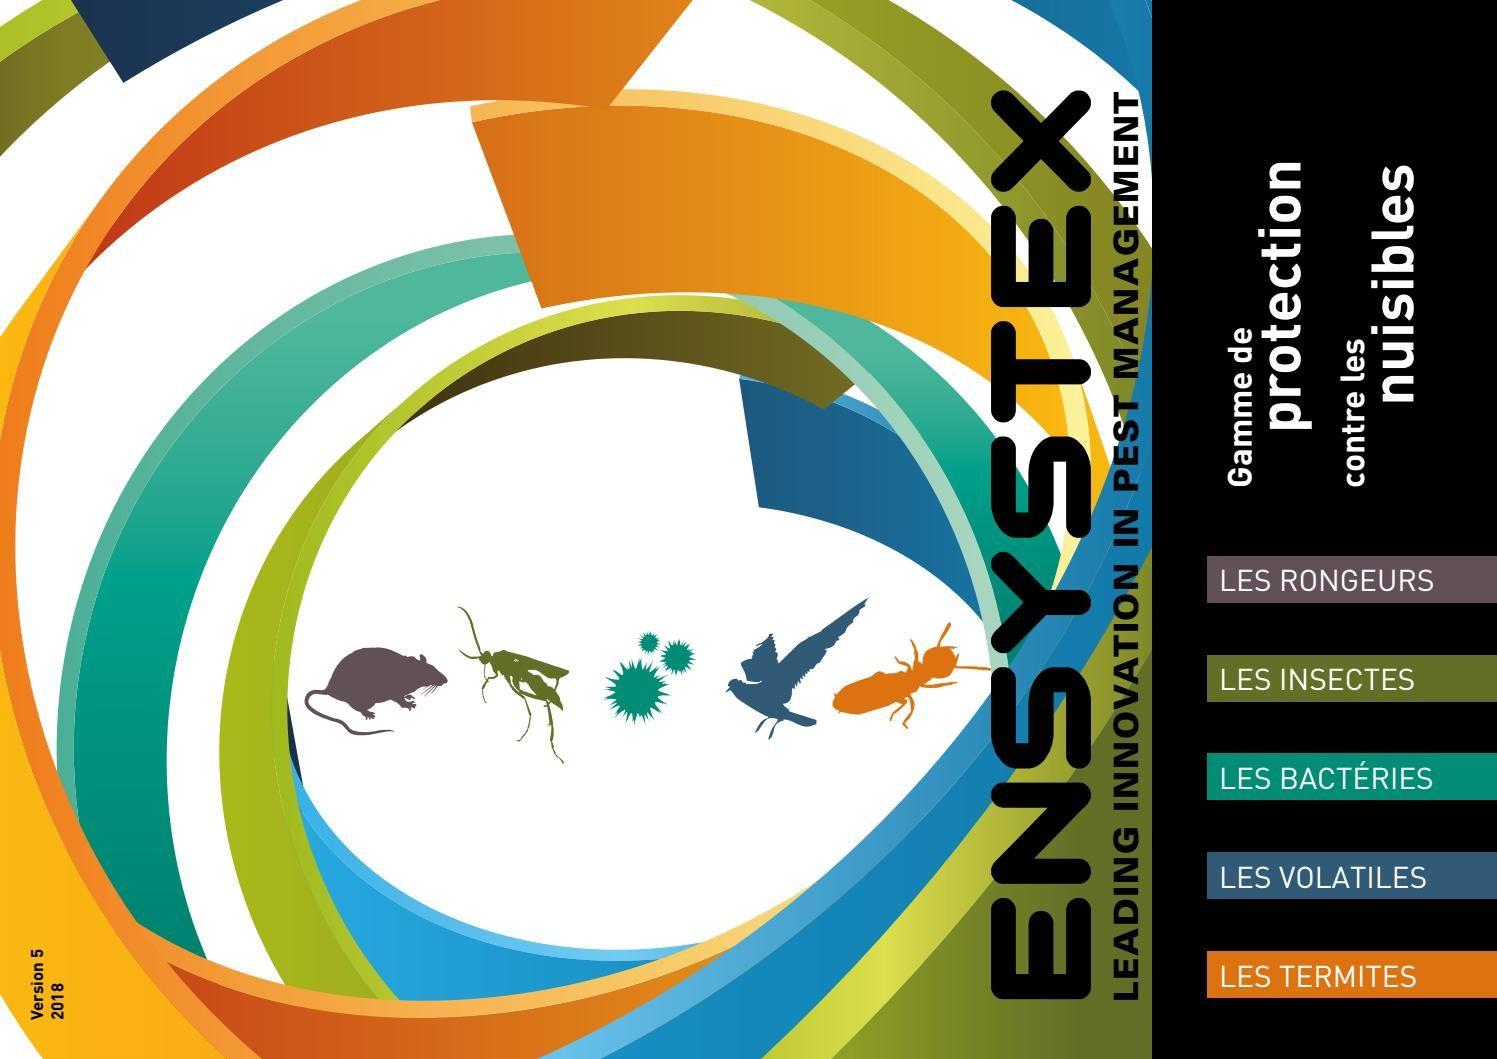 Bombe Anti Punaise De Lit Charmant Catalogue Ensystex Europe 2018 by Ensystex Europe issuu